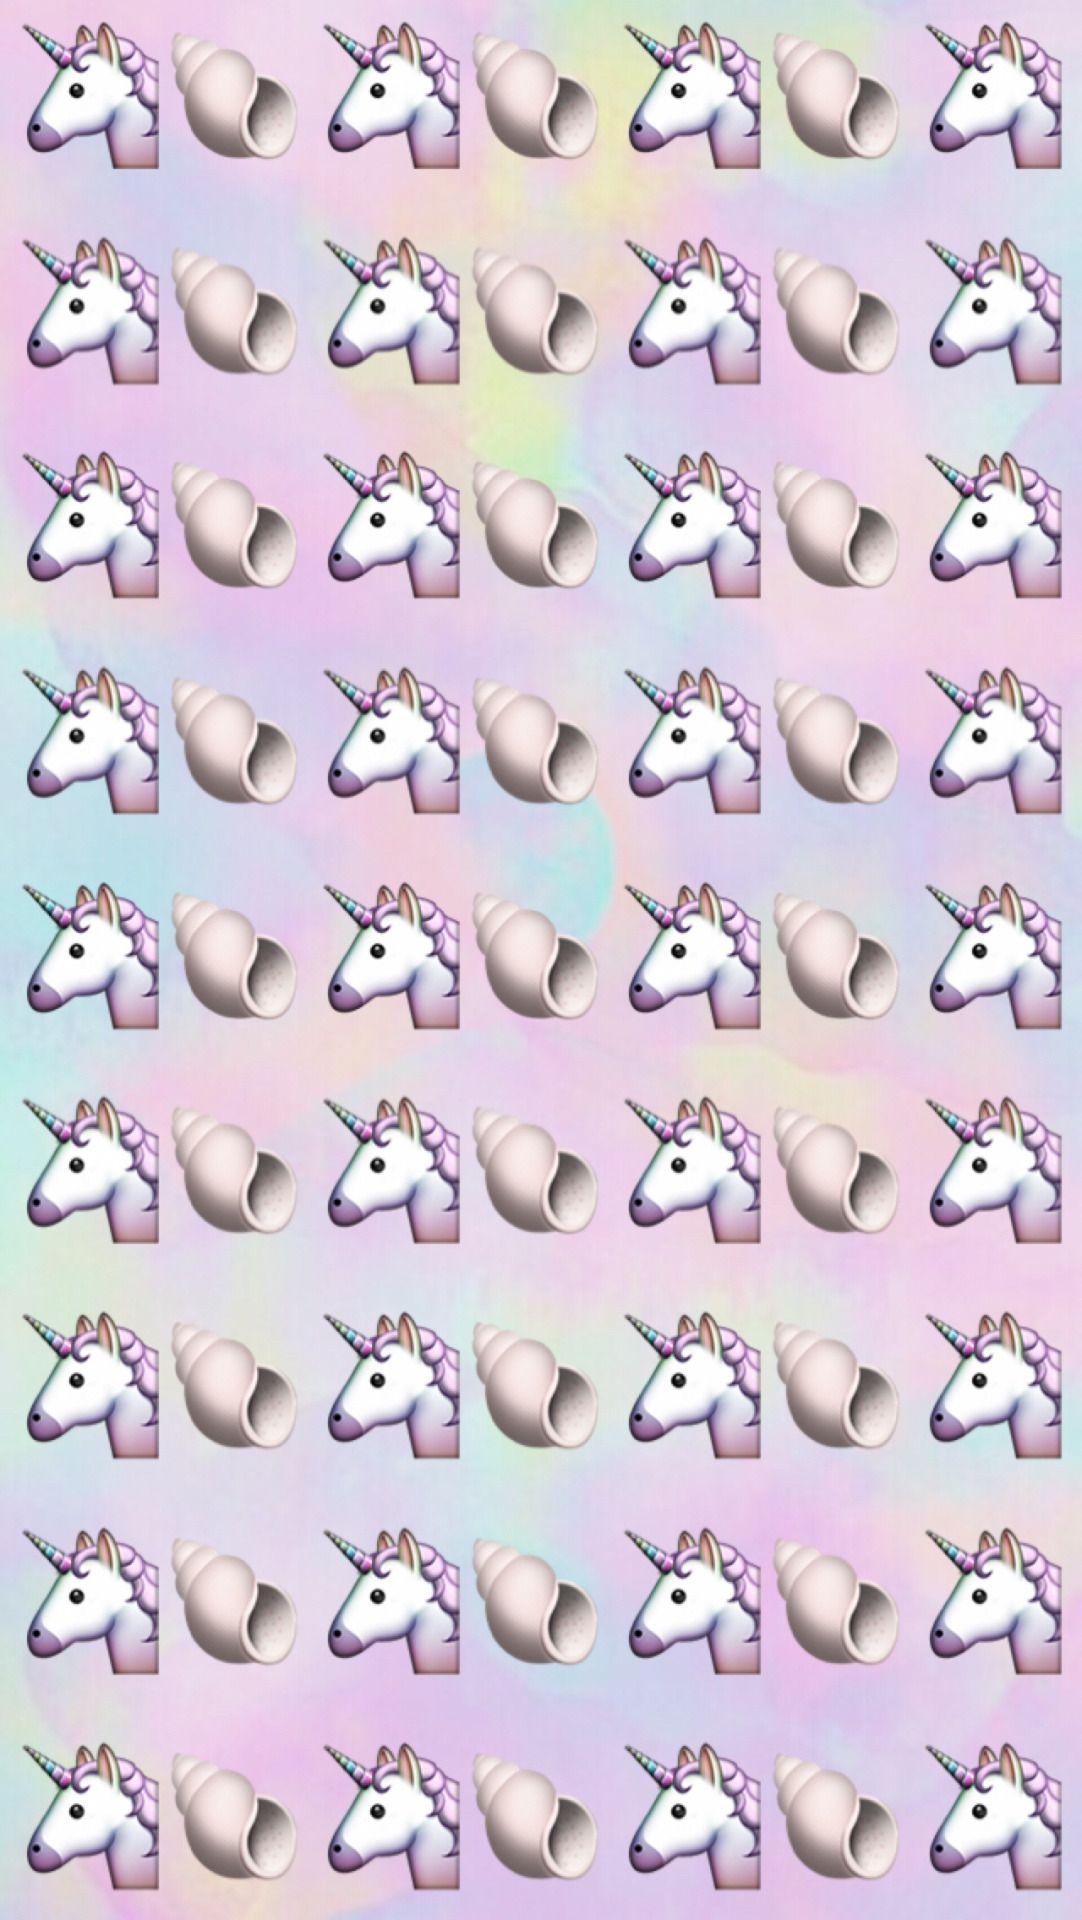 Wallpaper iphone tumblr unicorn - Unicorn Emoji Backgrounds Like If You Save Use A